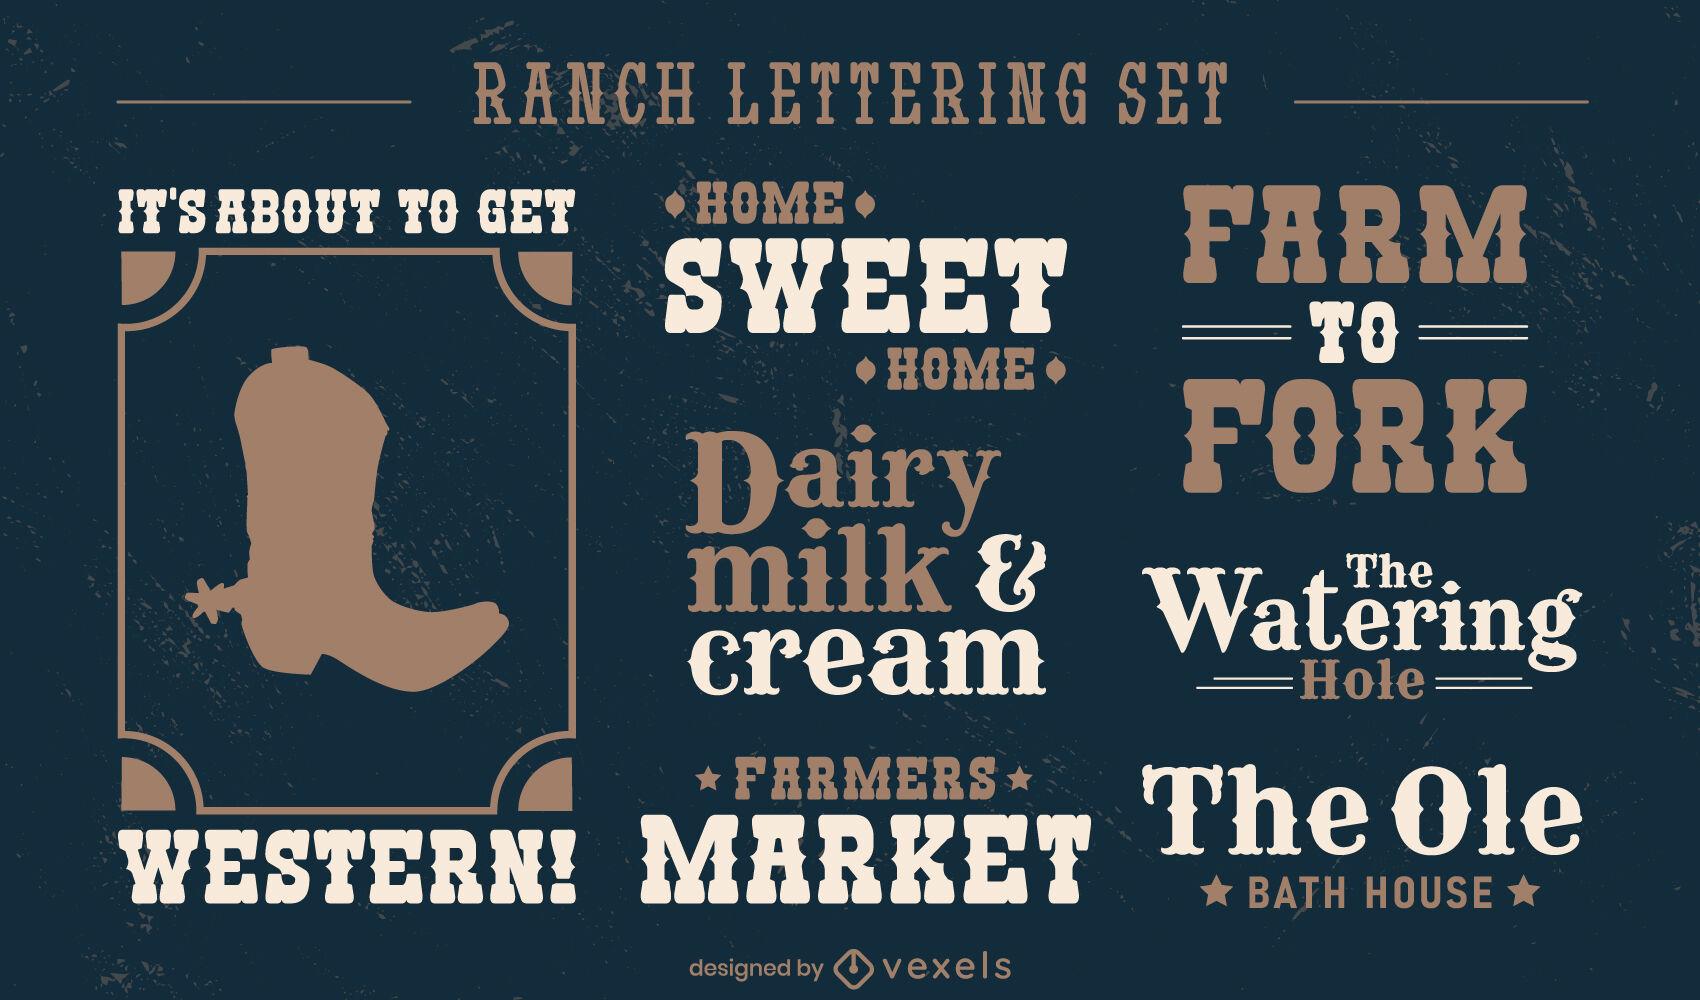 Cowboy ranch lettering badge set